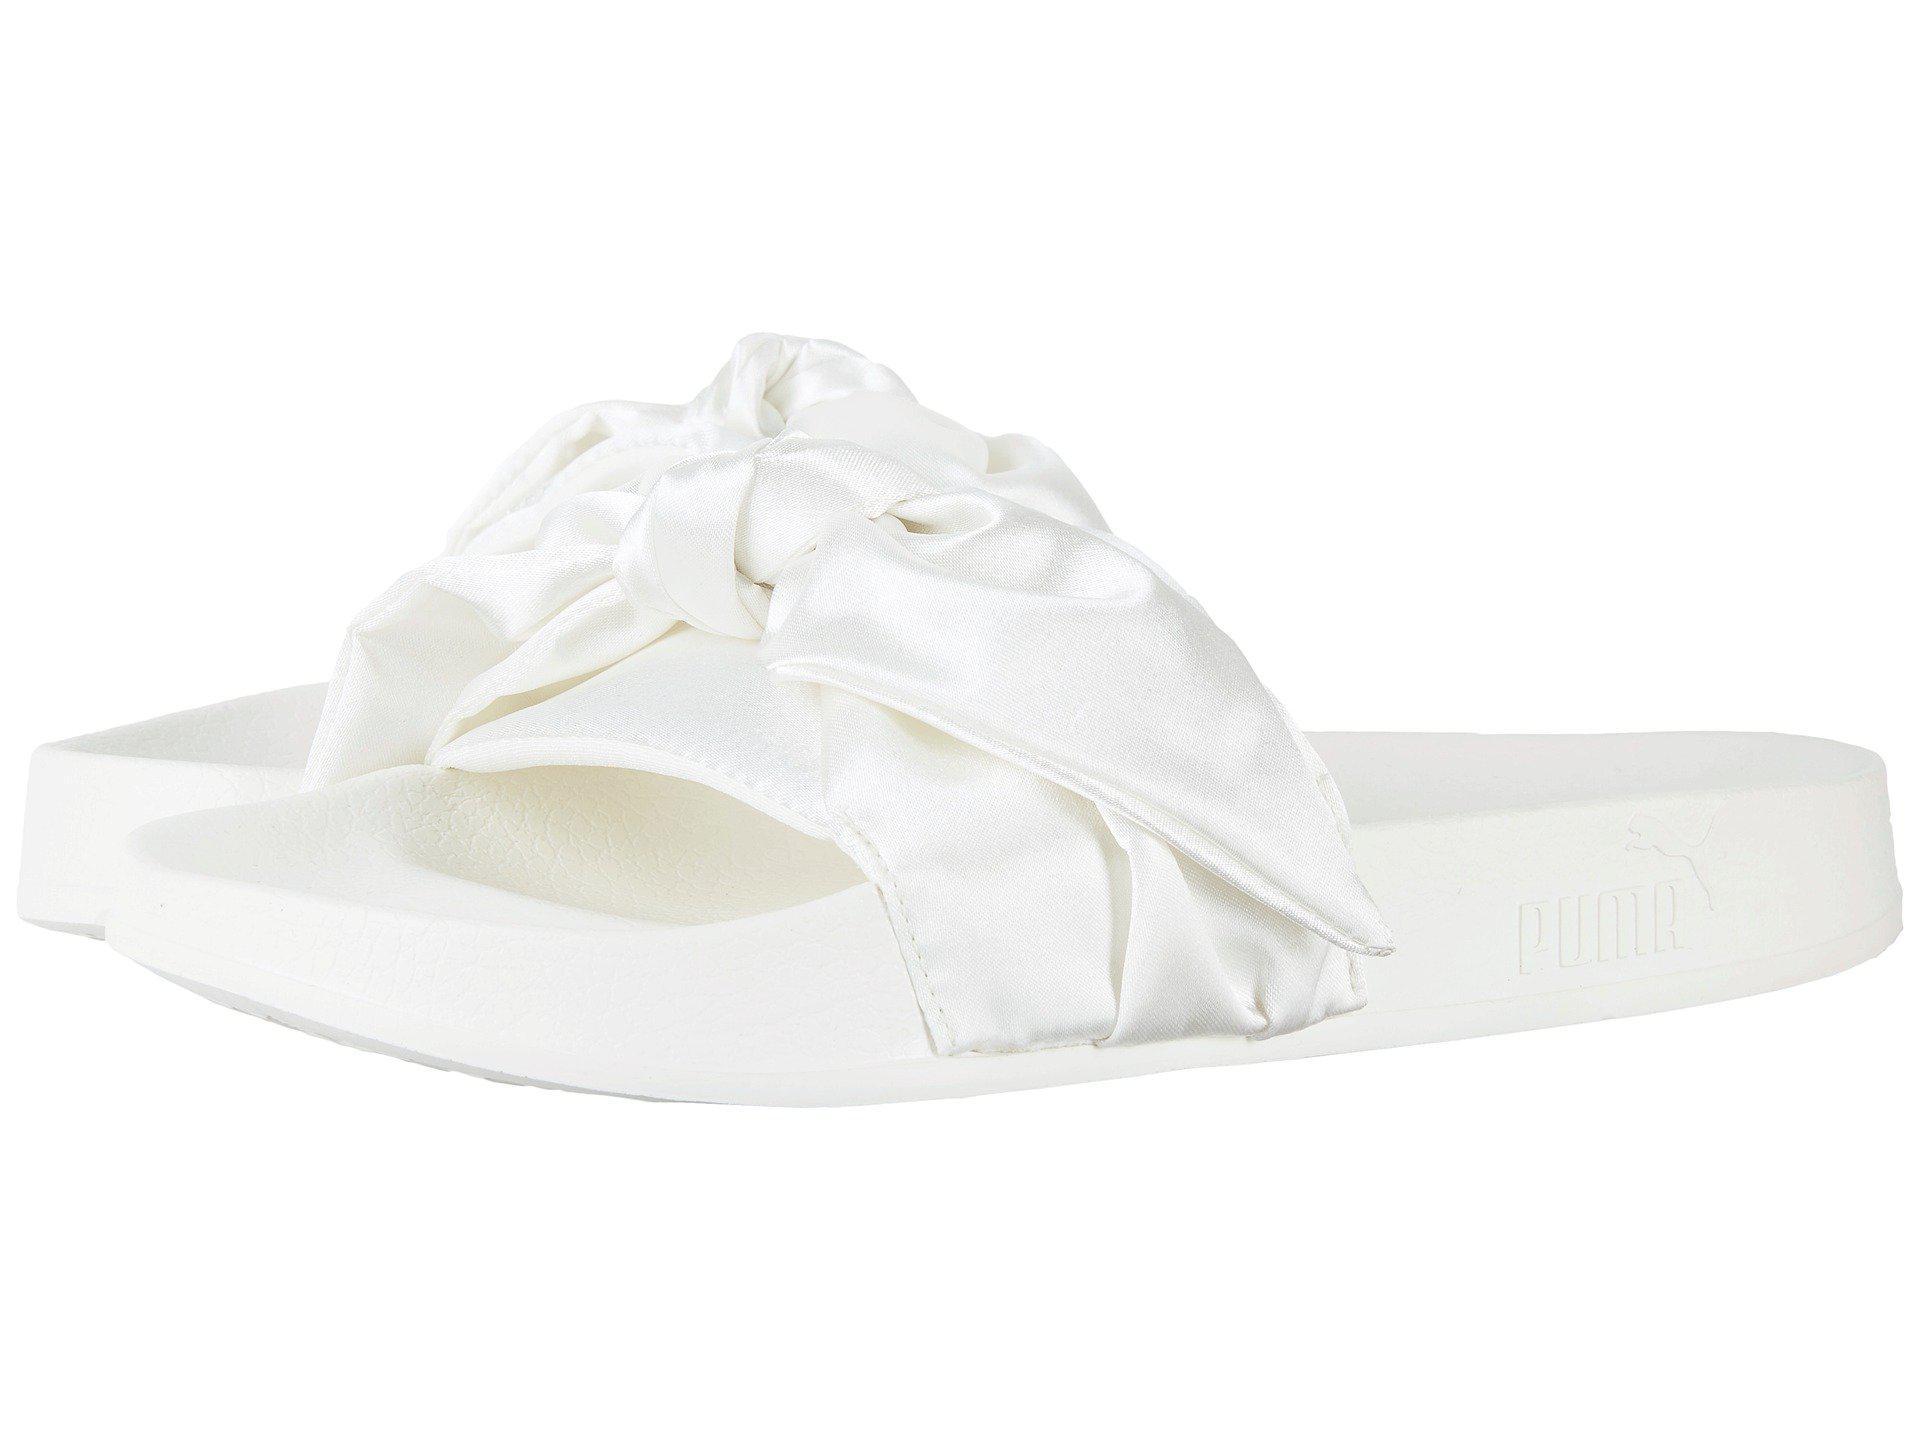 finest selection 03e21 4d7eb PUMA White Bow Slide Fenty By Rihanna